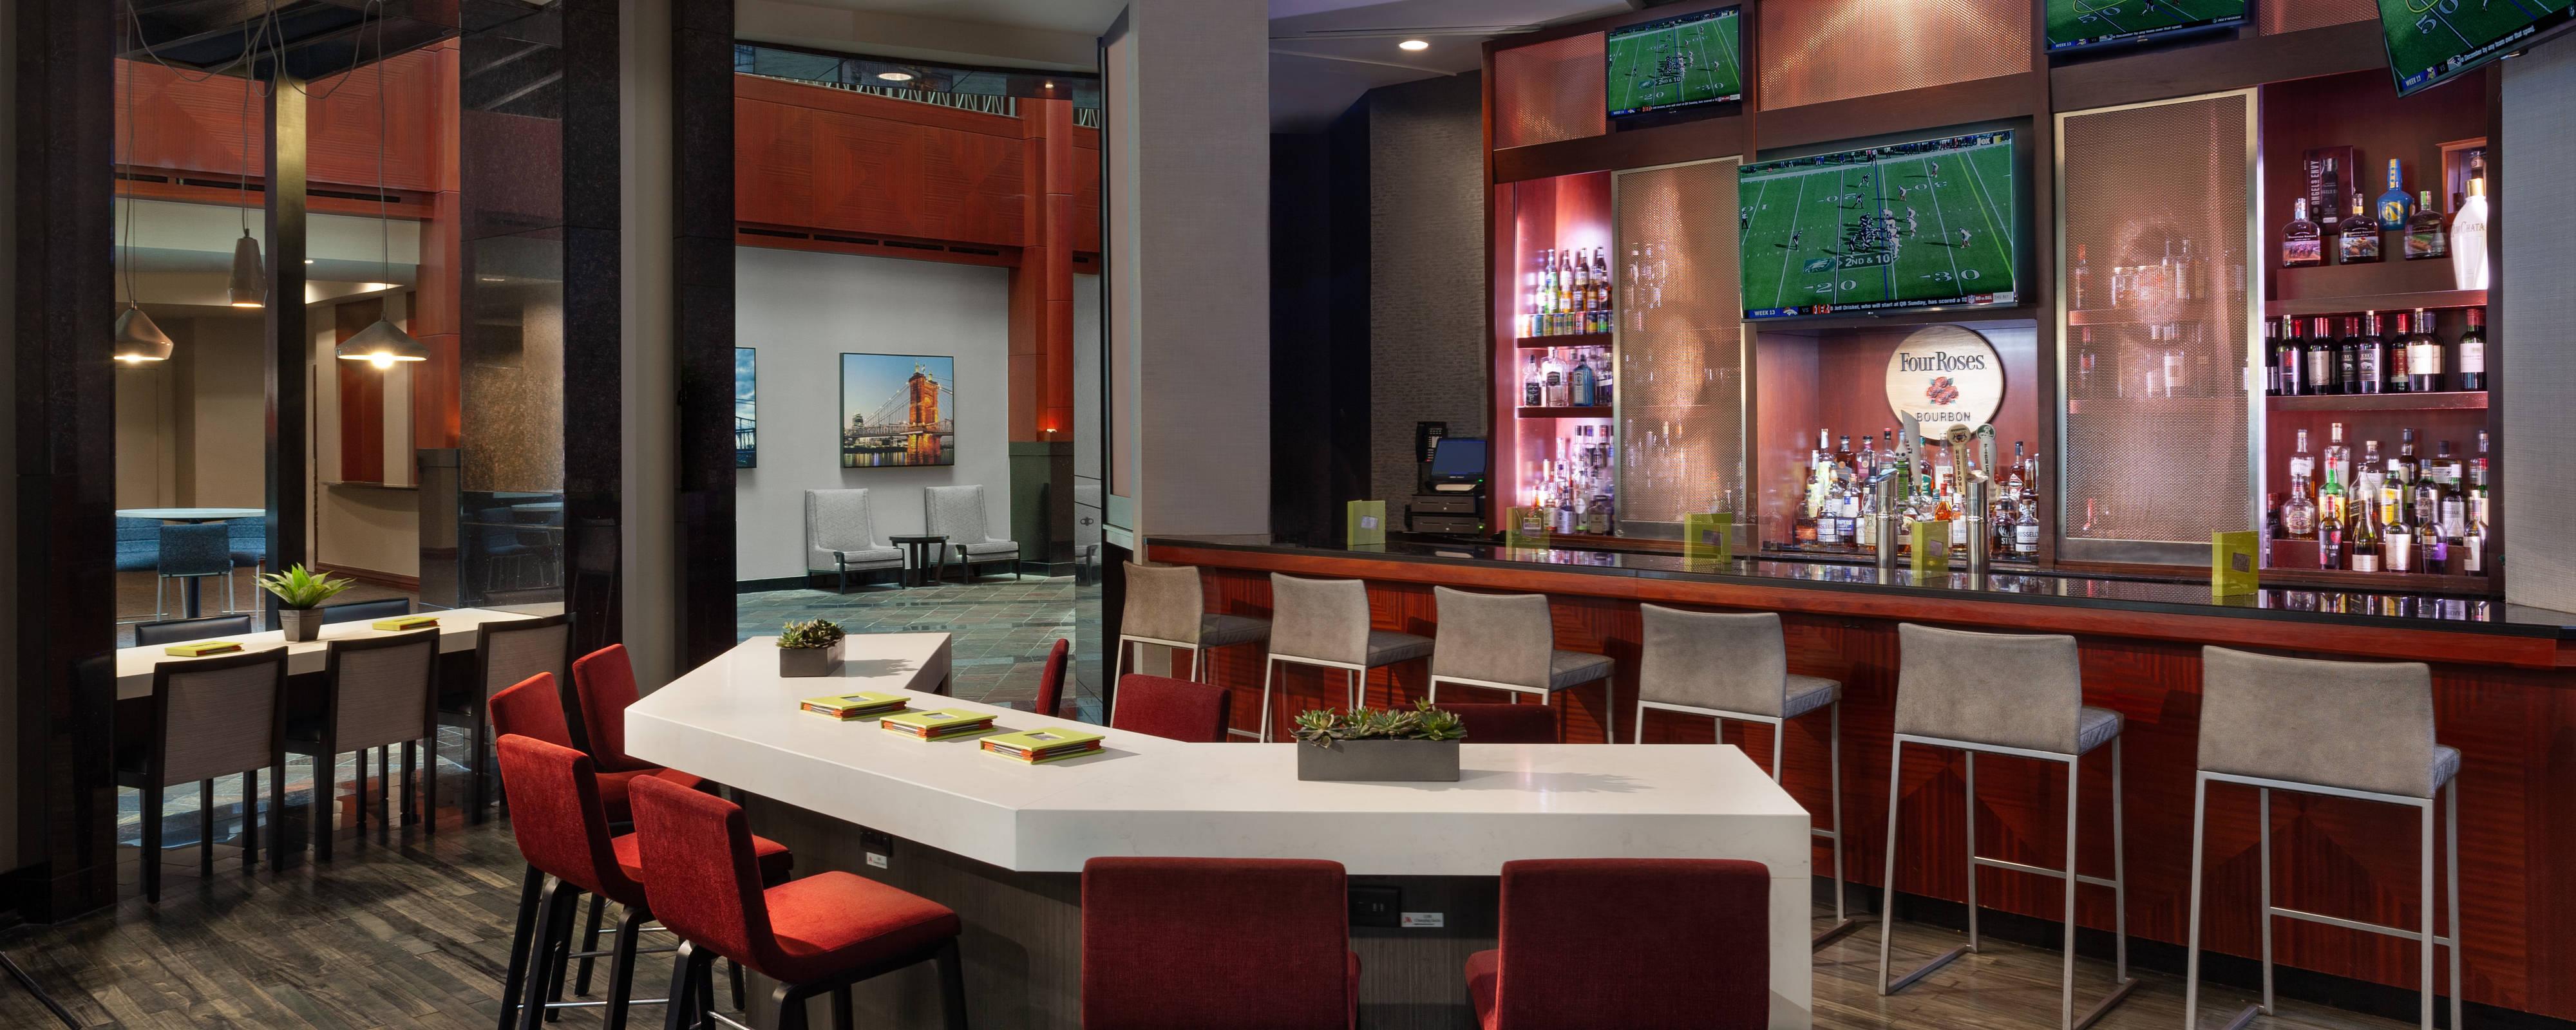 Covington, Ky Restaurants | Cincinnati Marriott At Rivercenter With Recent Cincinnati 3 Piece Dining Sets (View 18 of 20)